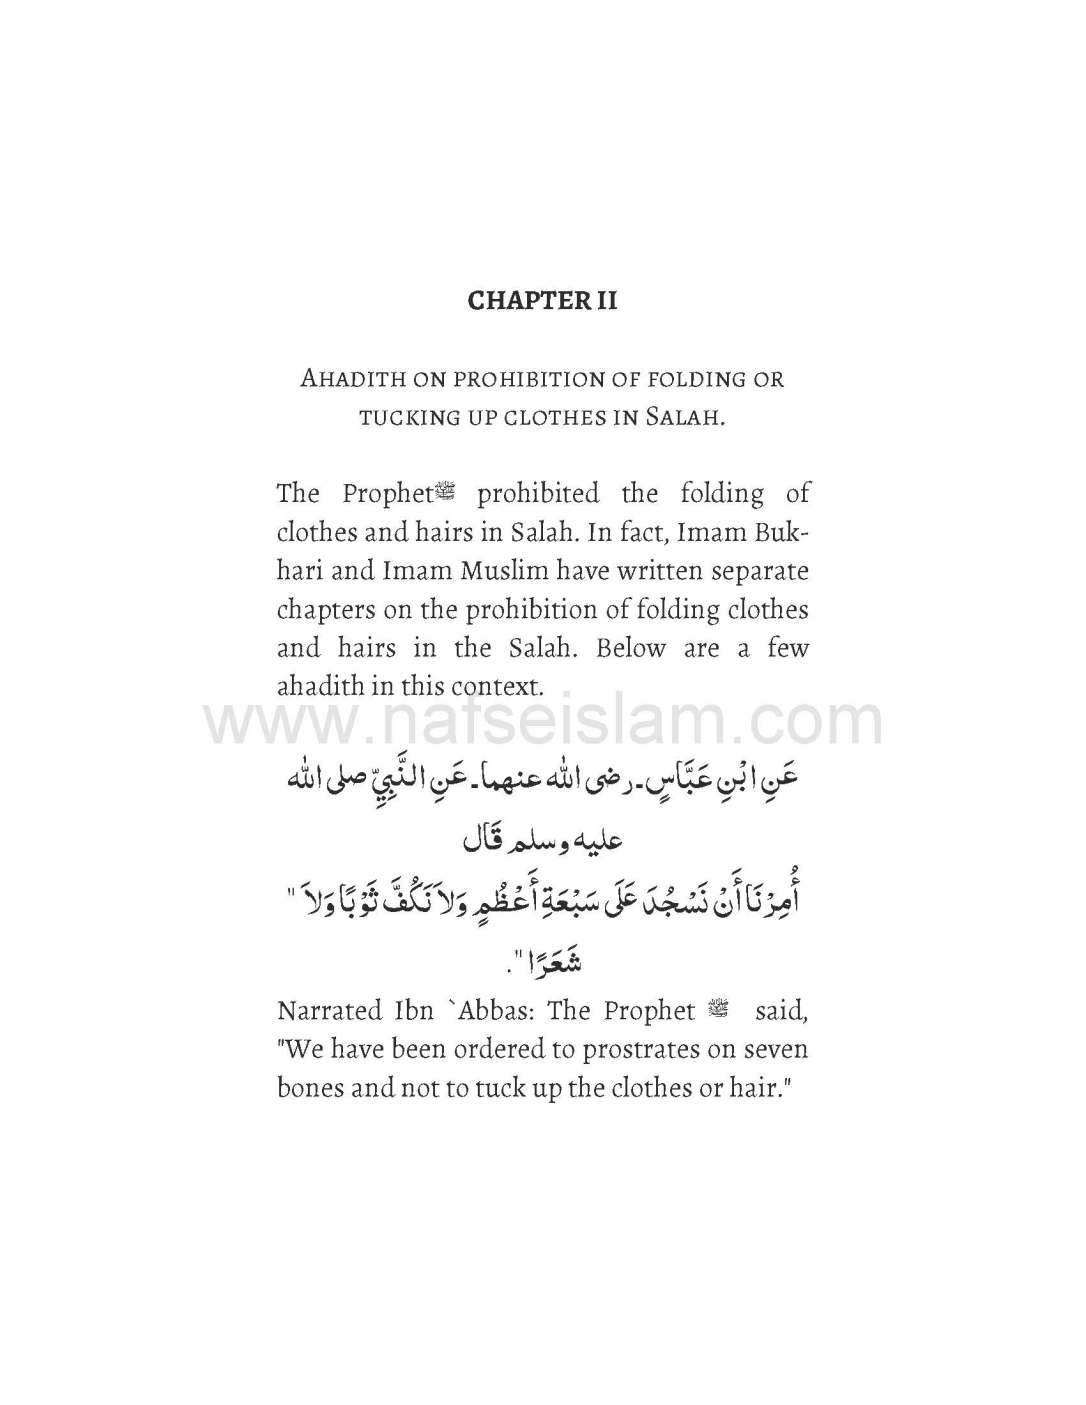 Islamic Ruling On Folding Pants In Salah_Page_07